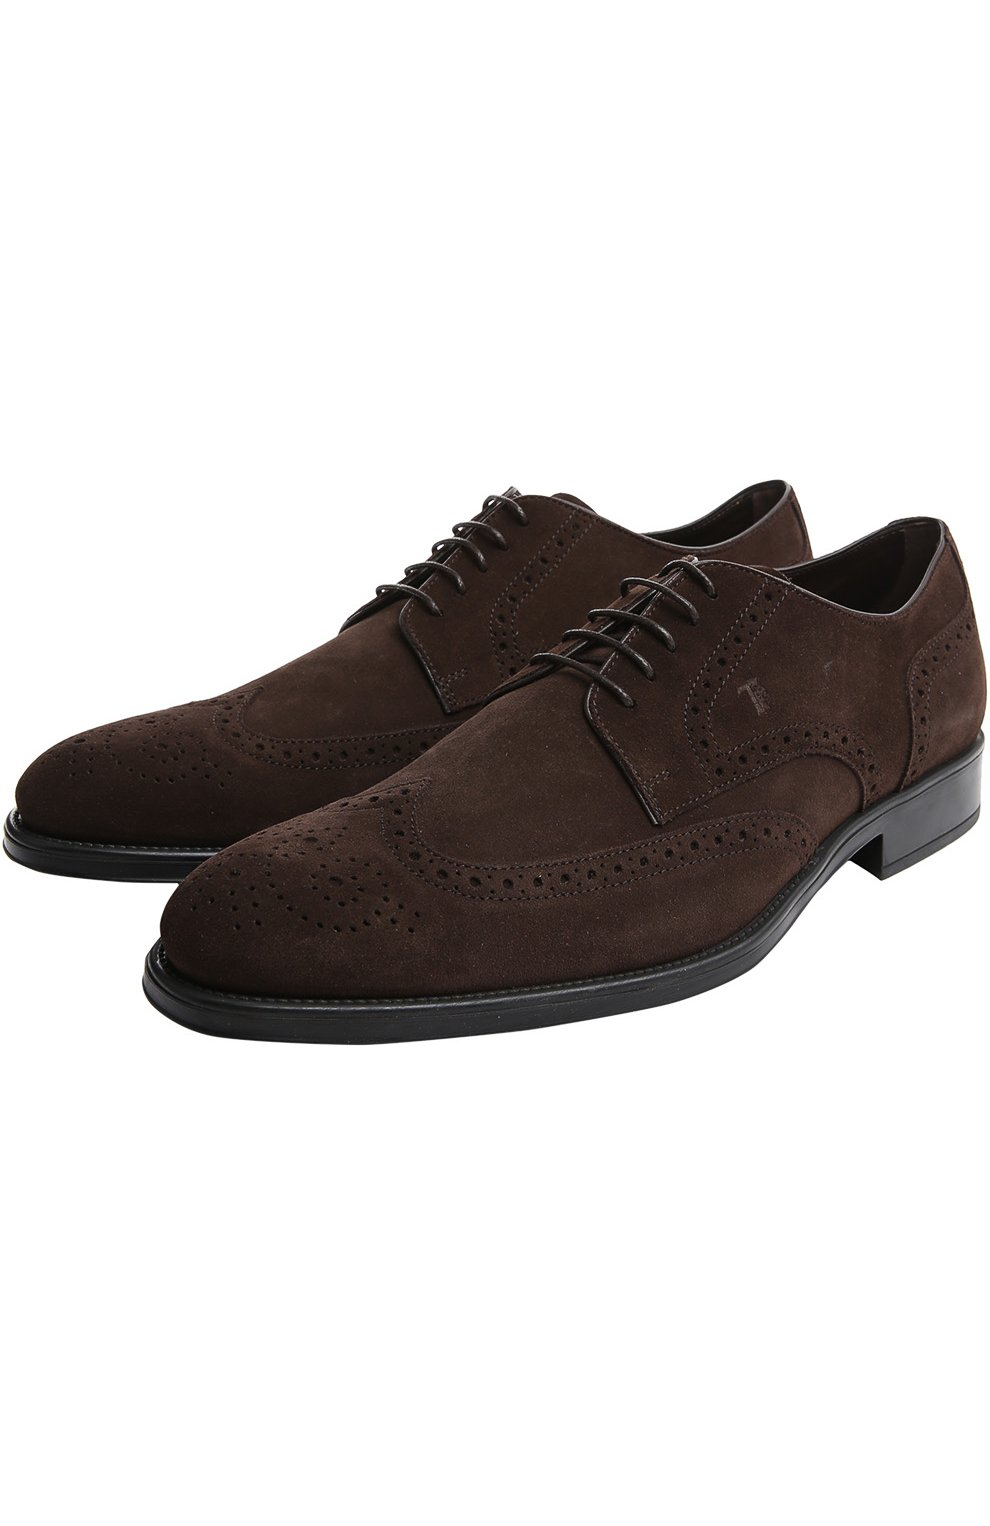 Туфли Gomma Rq Tod's темно-коричневые | Фото №2